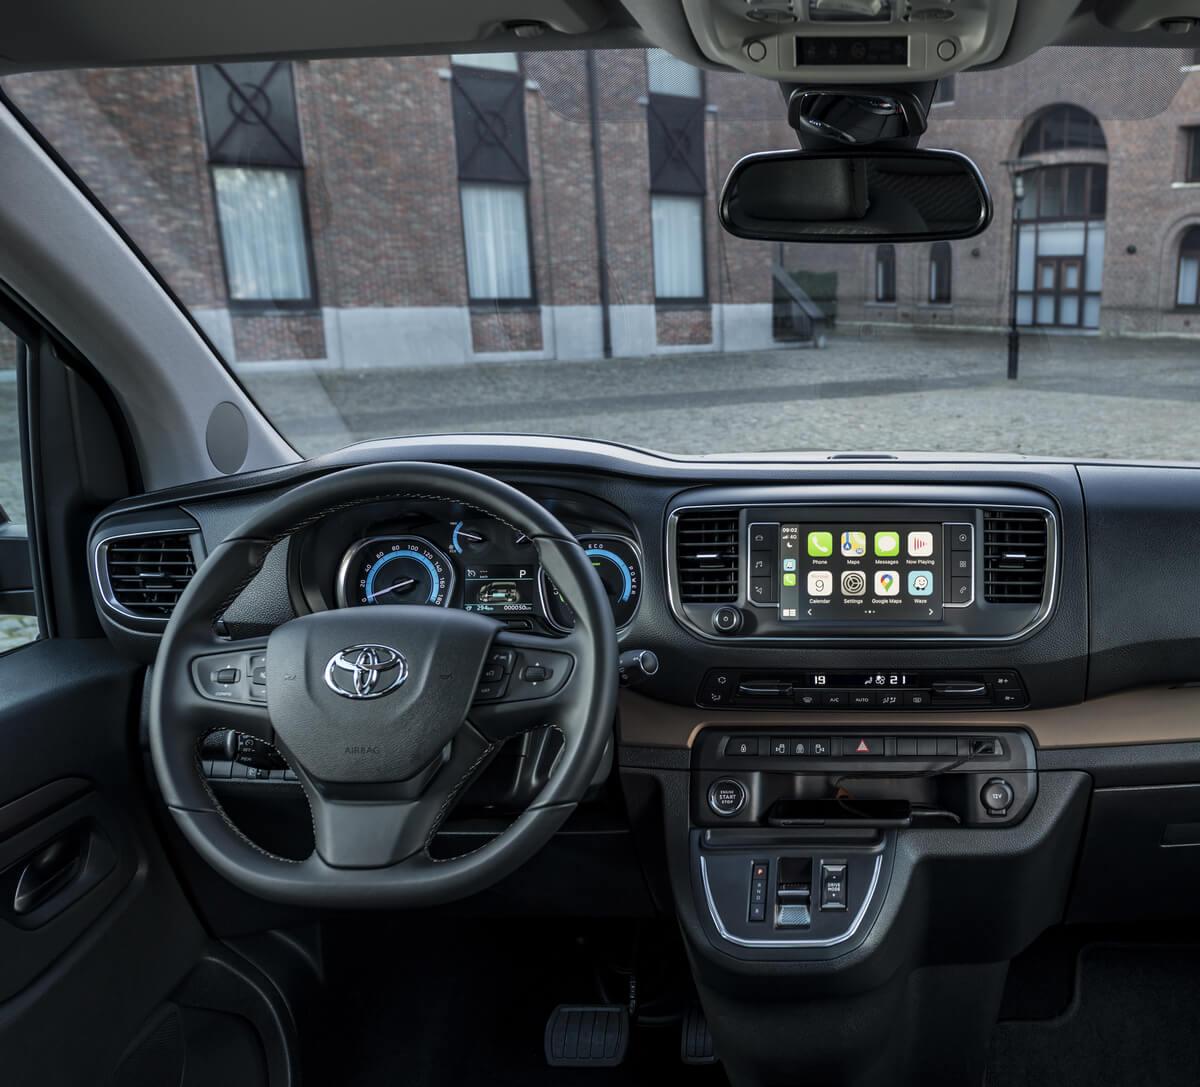 Toyota ProAce Verso Electric interior